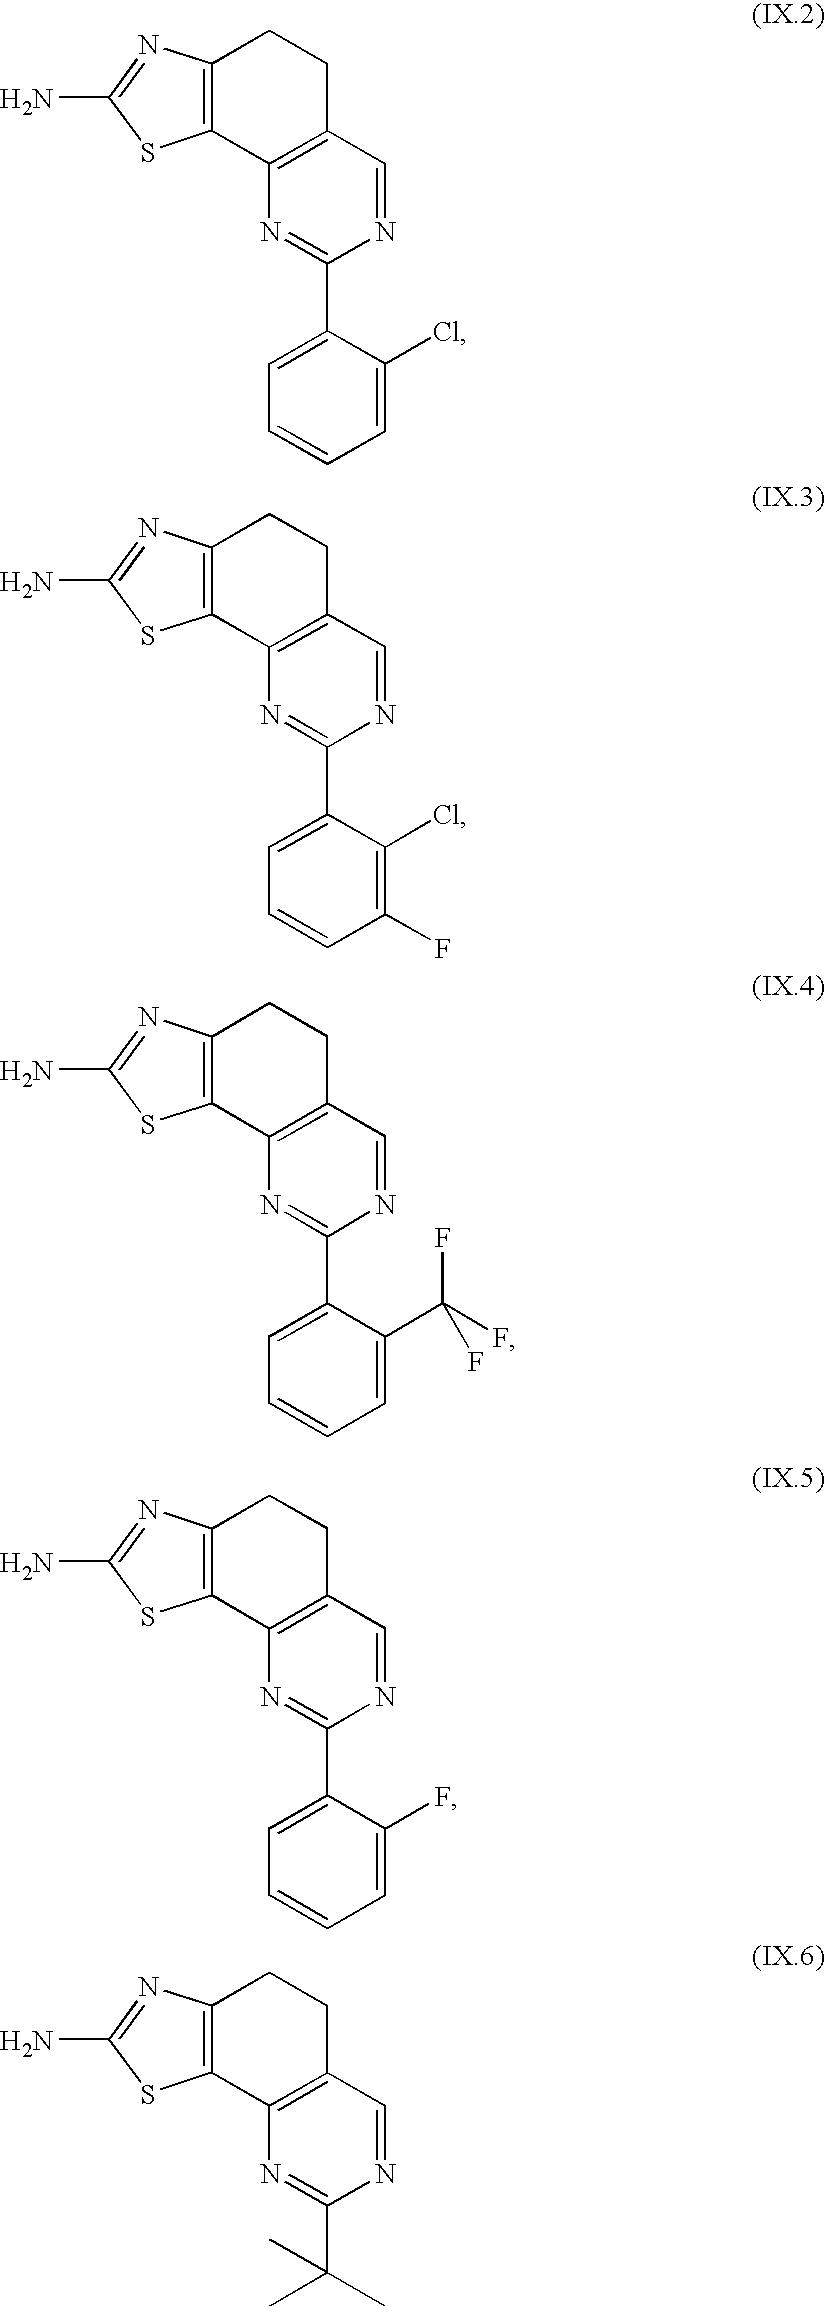 US20070238746A1 - Thiazolyl-dihydro-chinazoline - Google Patents